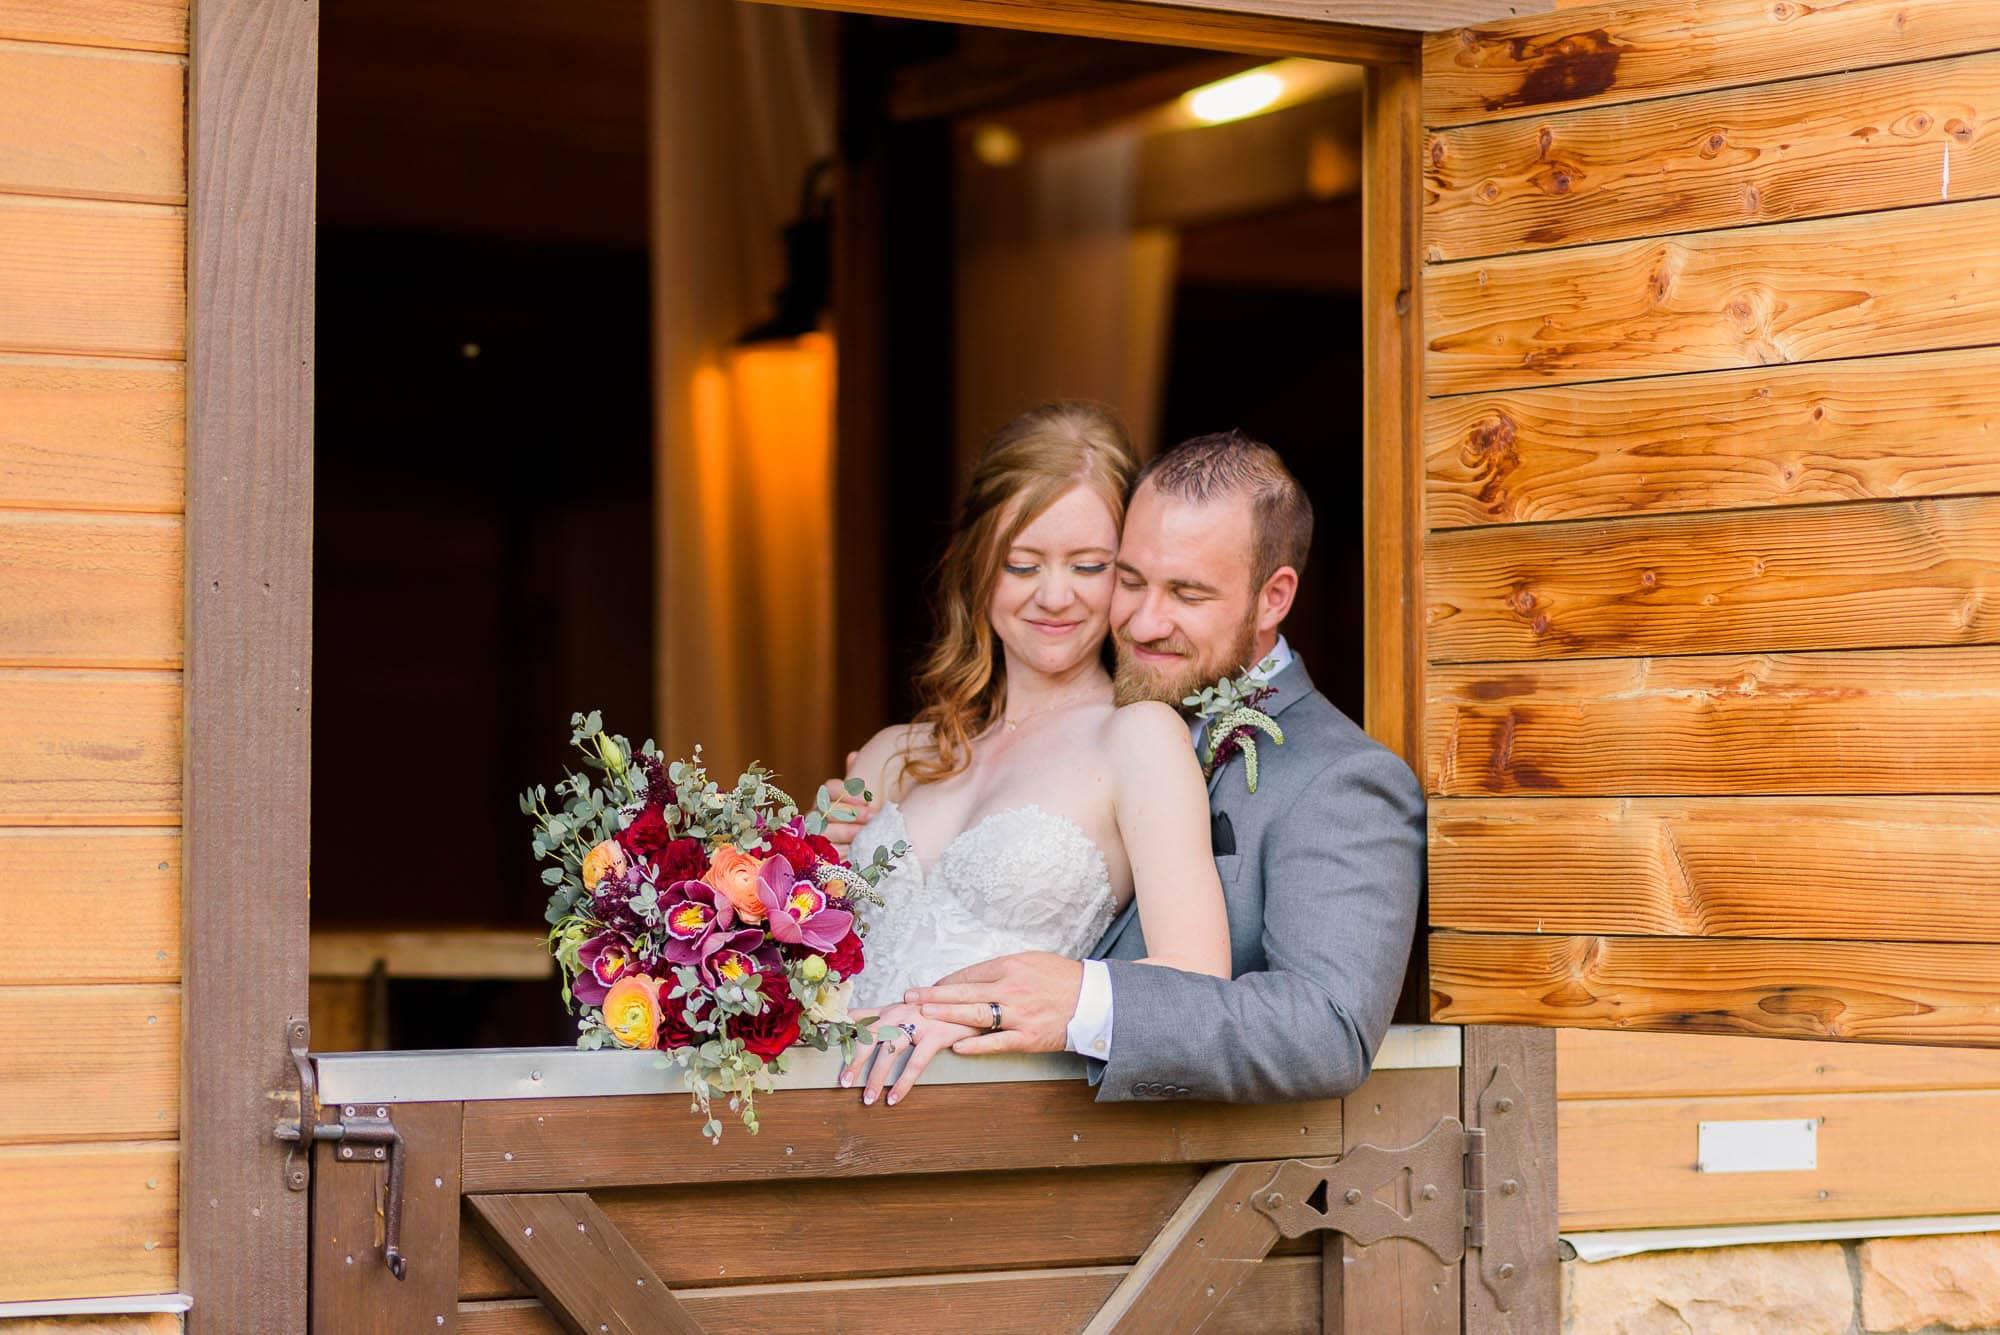 401_Alan_and_Heidi_Serendipity_Garden_Wedding_10-27-2018